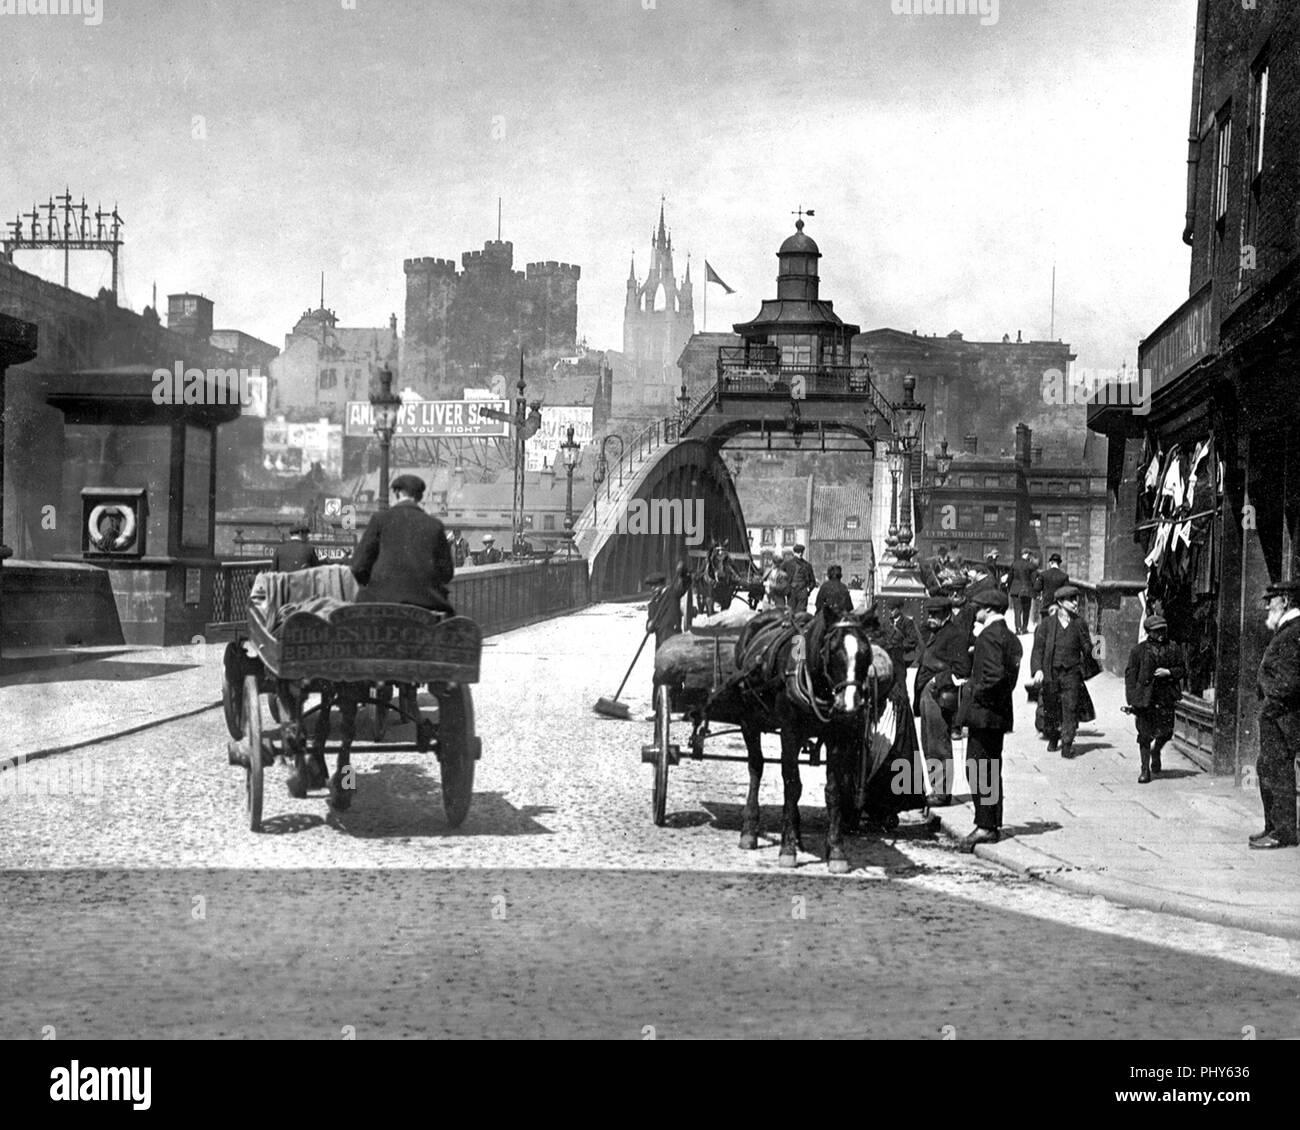 Bridge over the Tyne, Gateshead, early 1900s - Stock Image